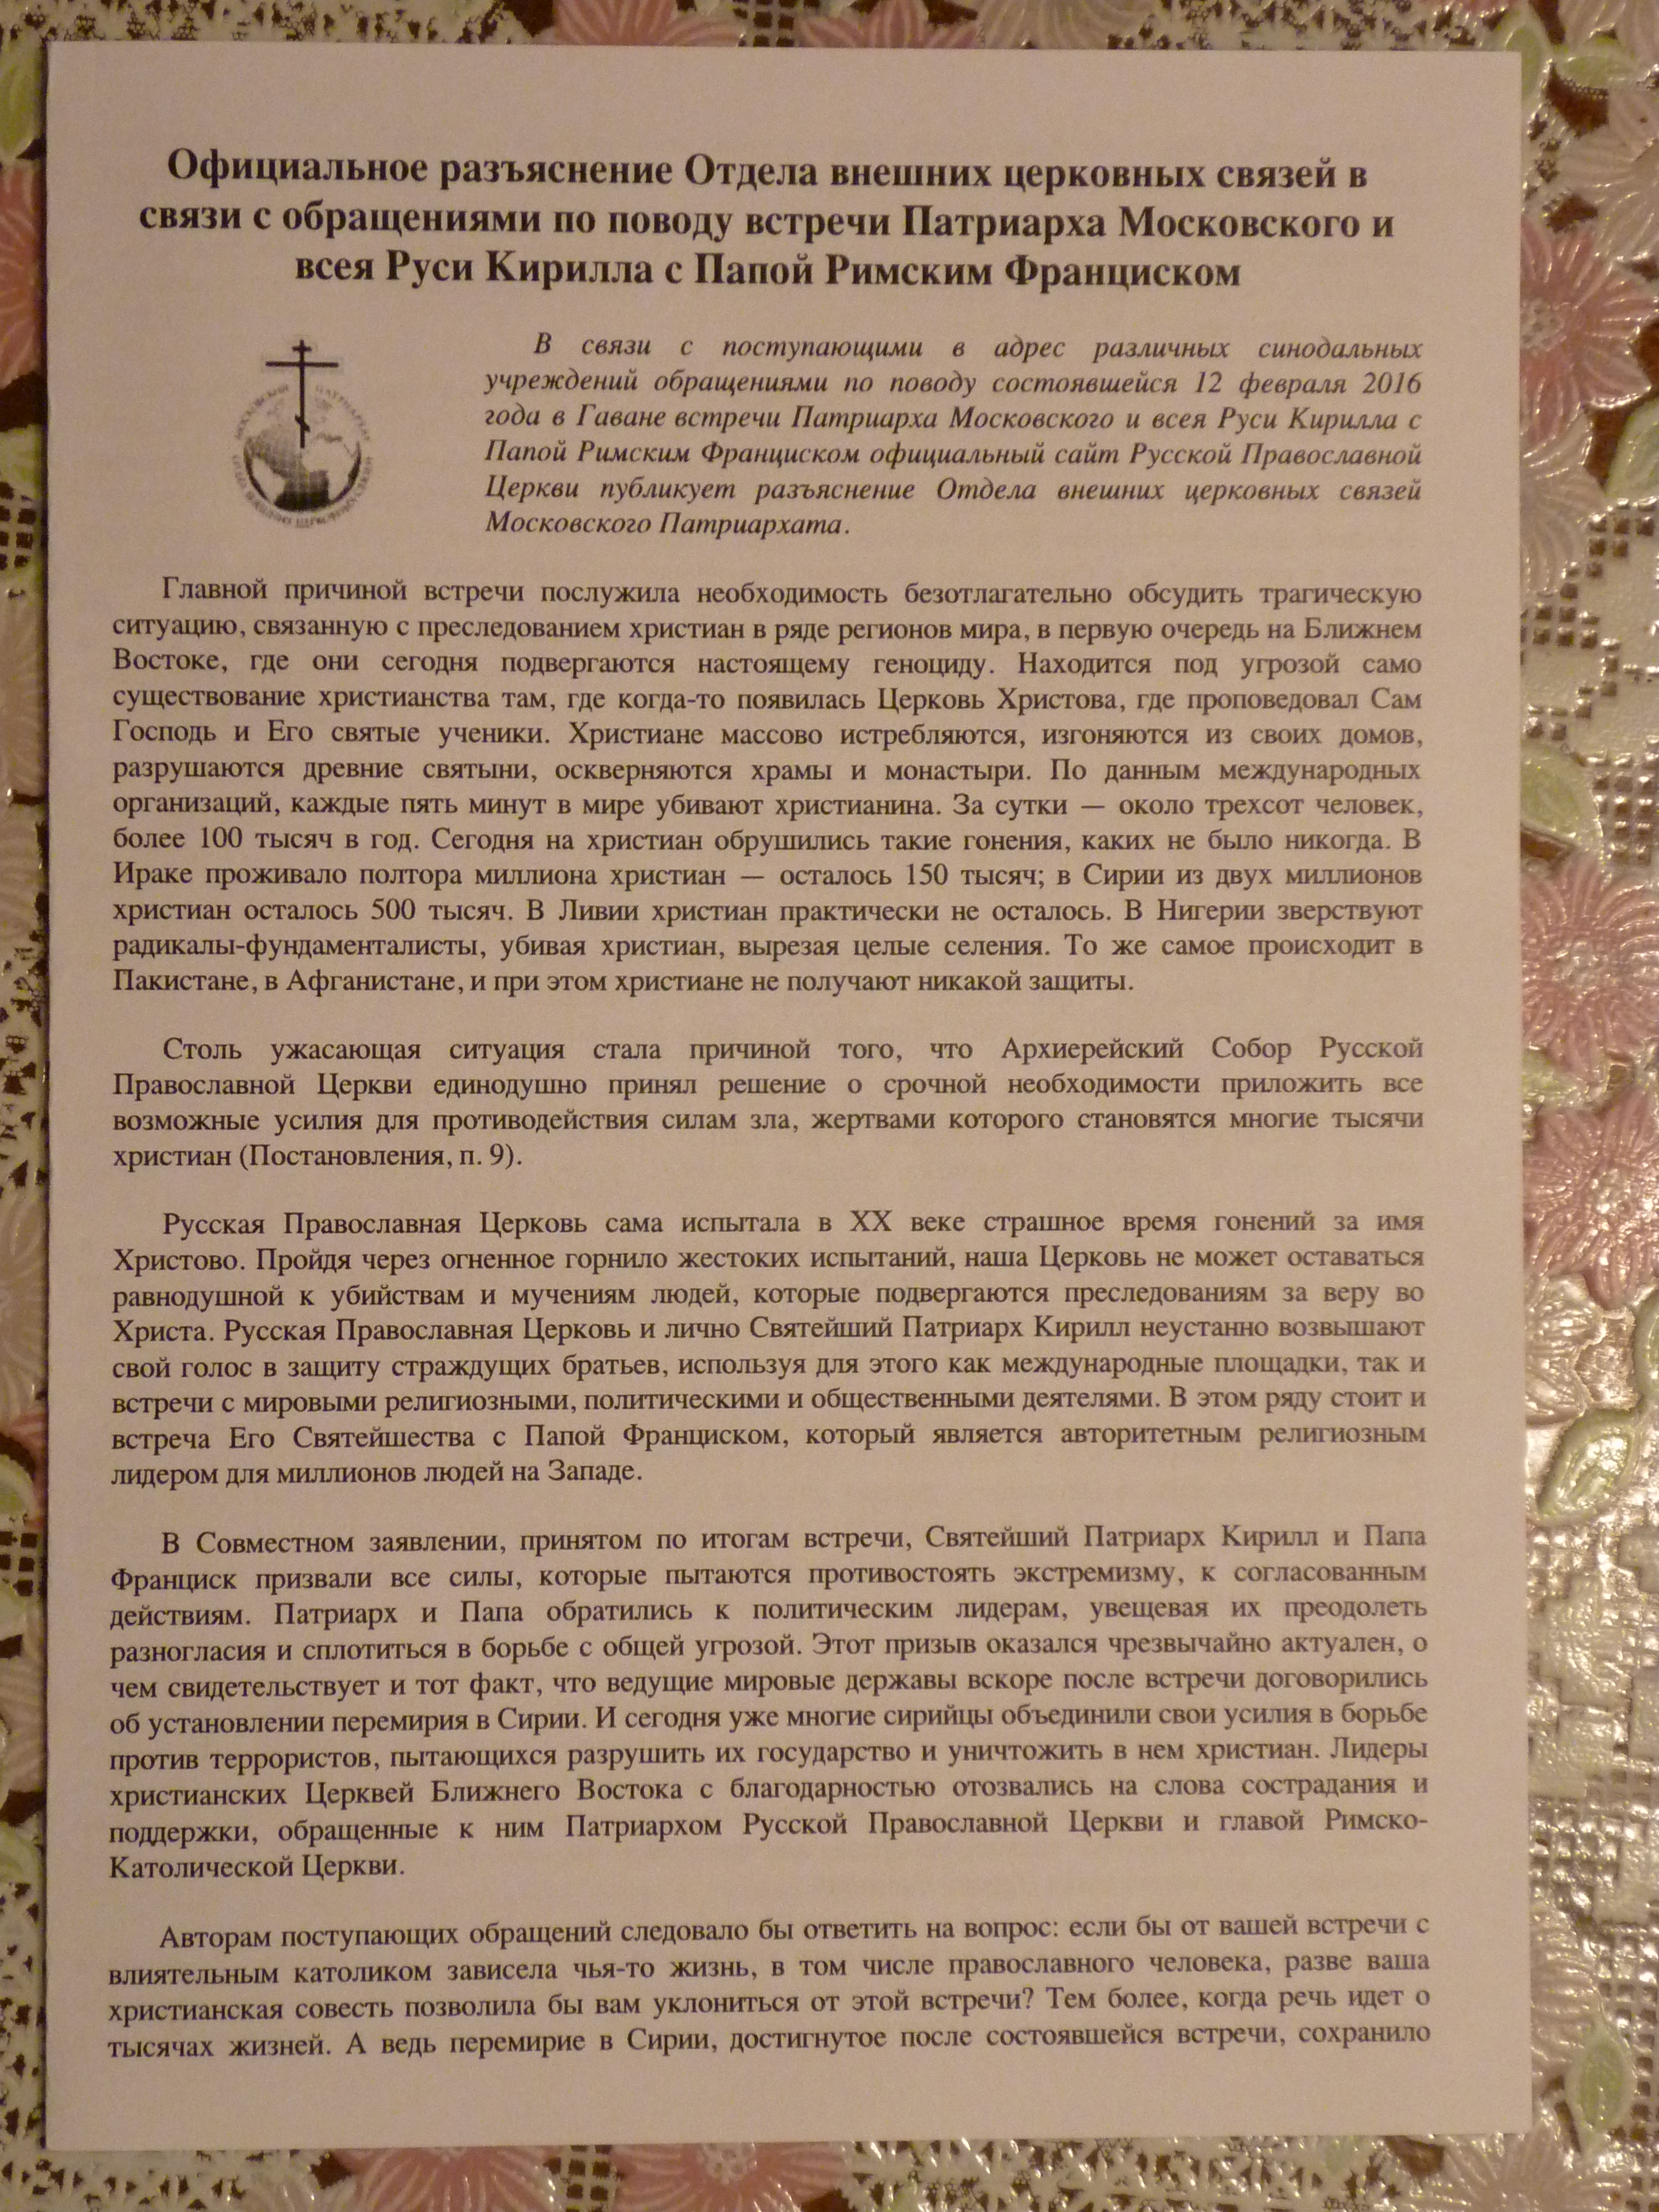 http://sf.uploads.ru/RdMpT.jpg